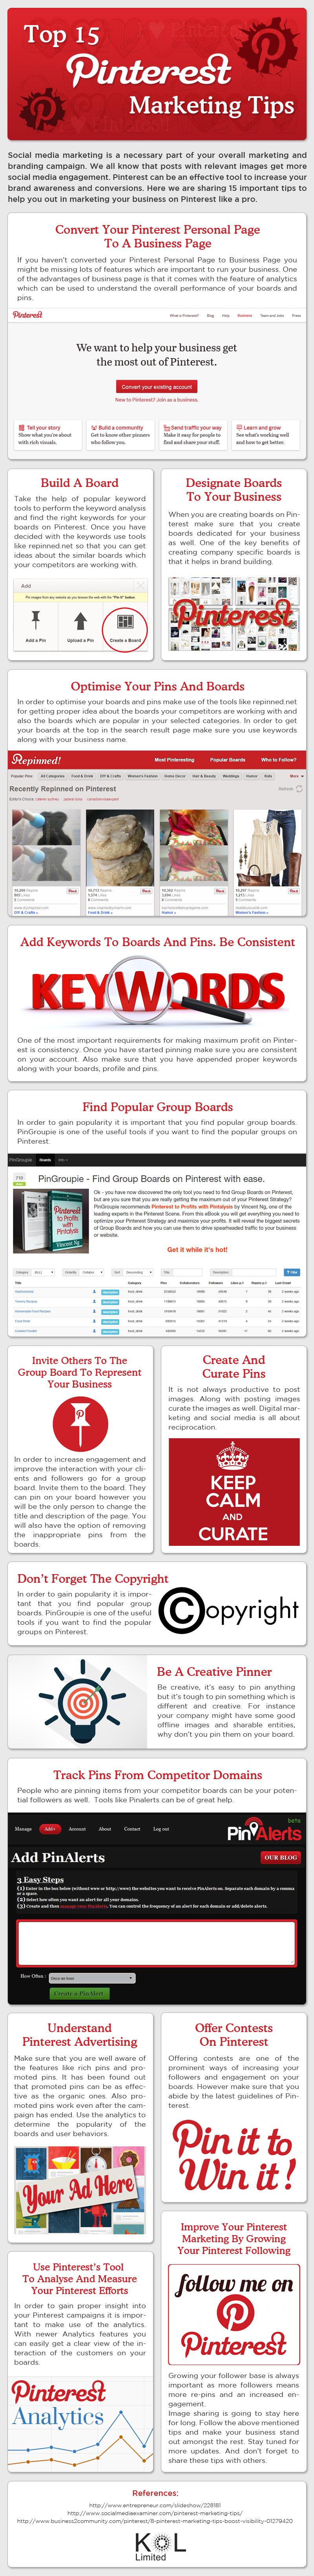 Top 15 Pinterest Marketing Tips